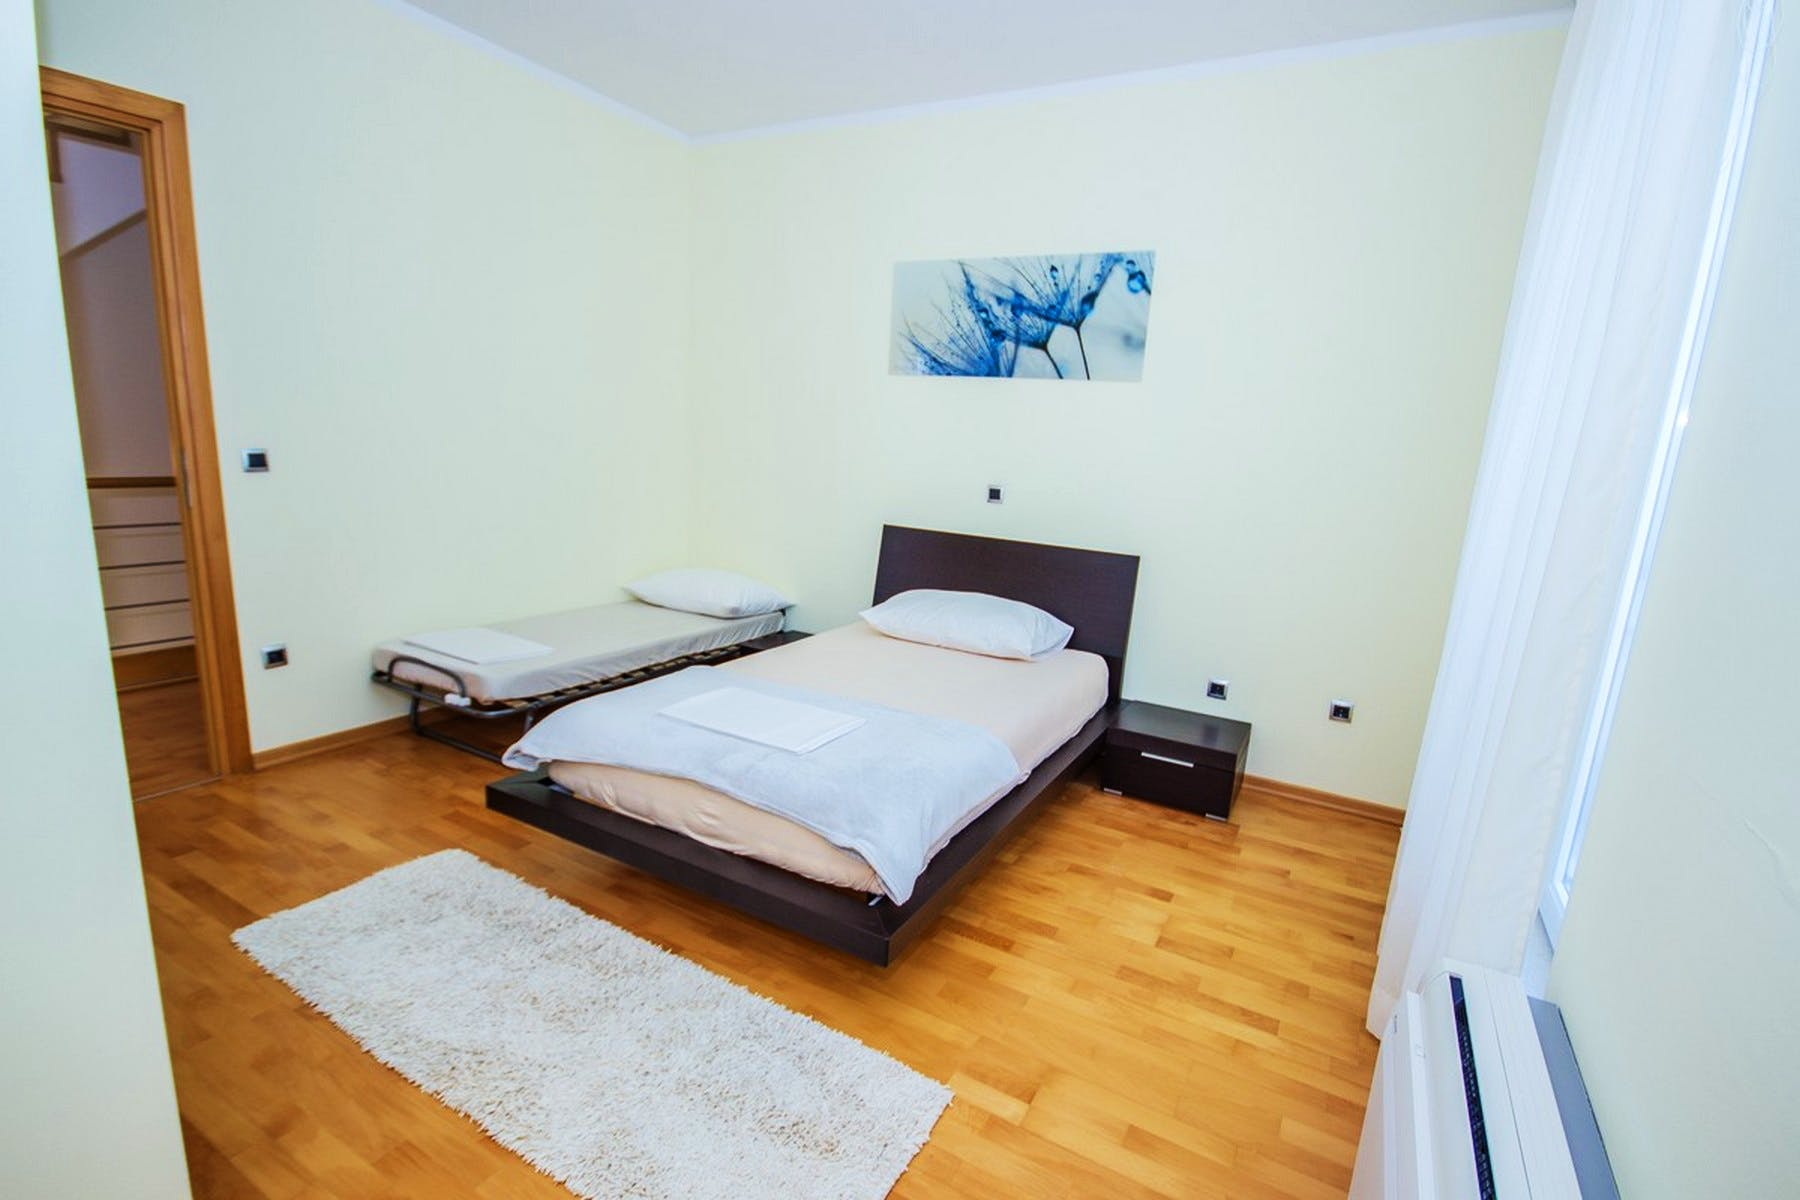 Spacious single bedroom